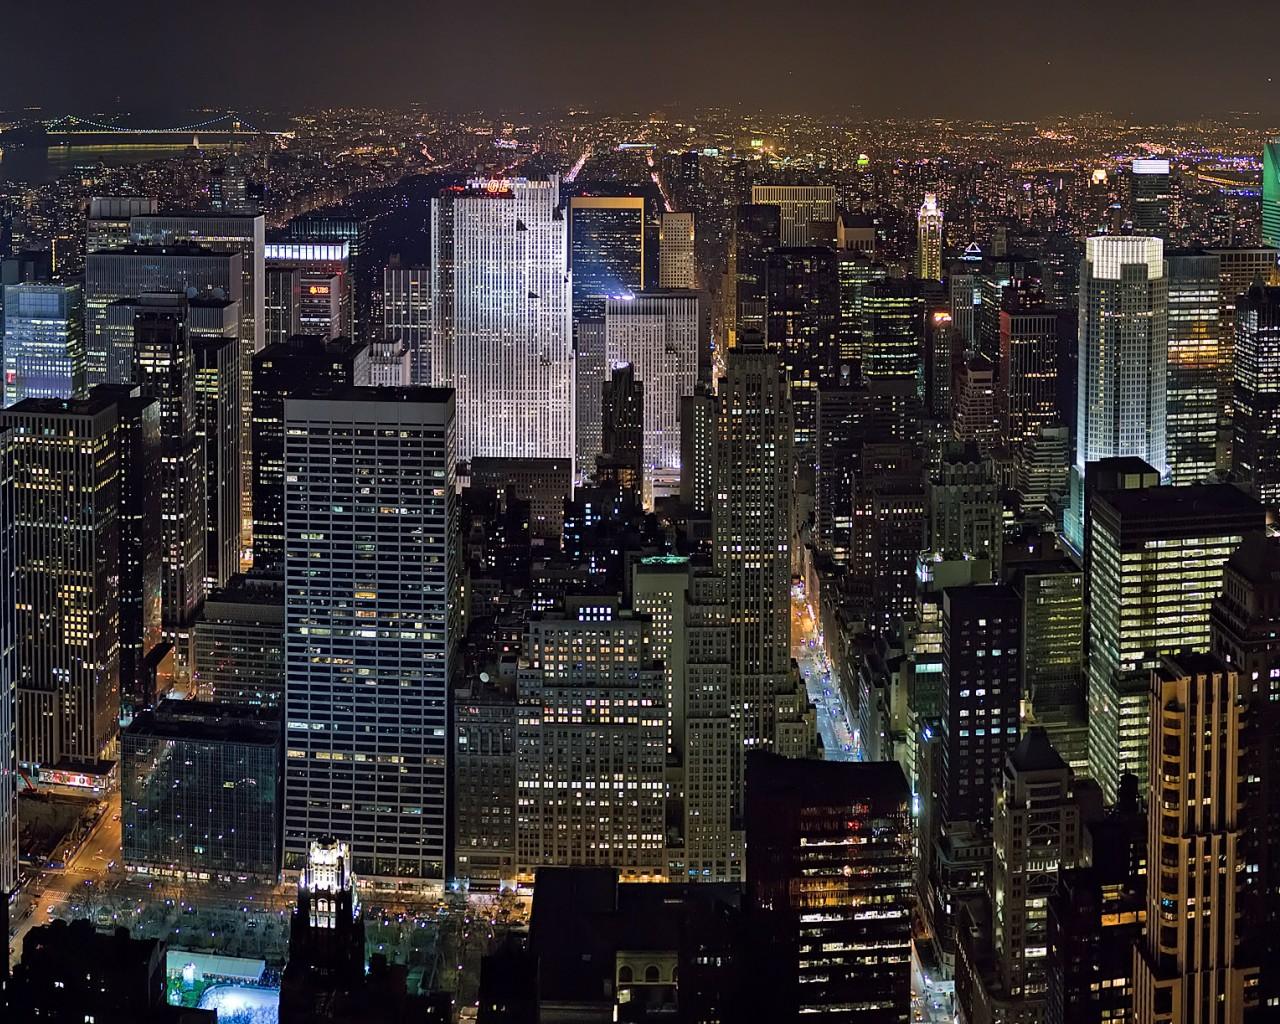 http://4.bp.blogspot.com/-xzgWeY8QkX0/T4UVa2TmiqI/AAAAAAAAAoc/qKjTGa54tCU/s1600/Top+Best+HD+Newyork+Desktop+Wallpapers+(25).jpg